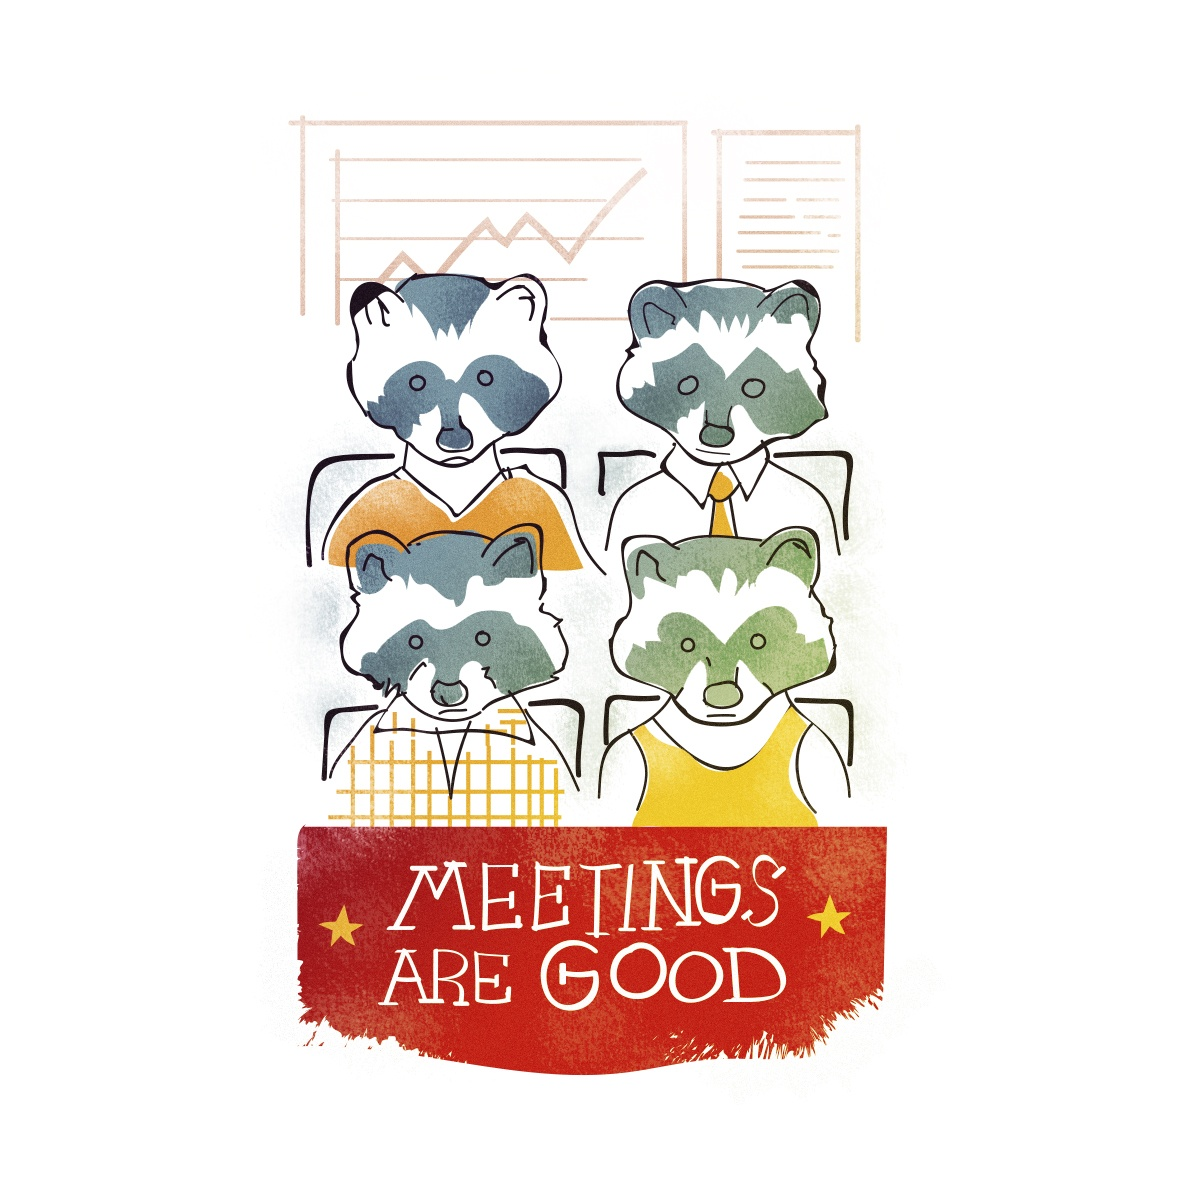 Meetings Are Good